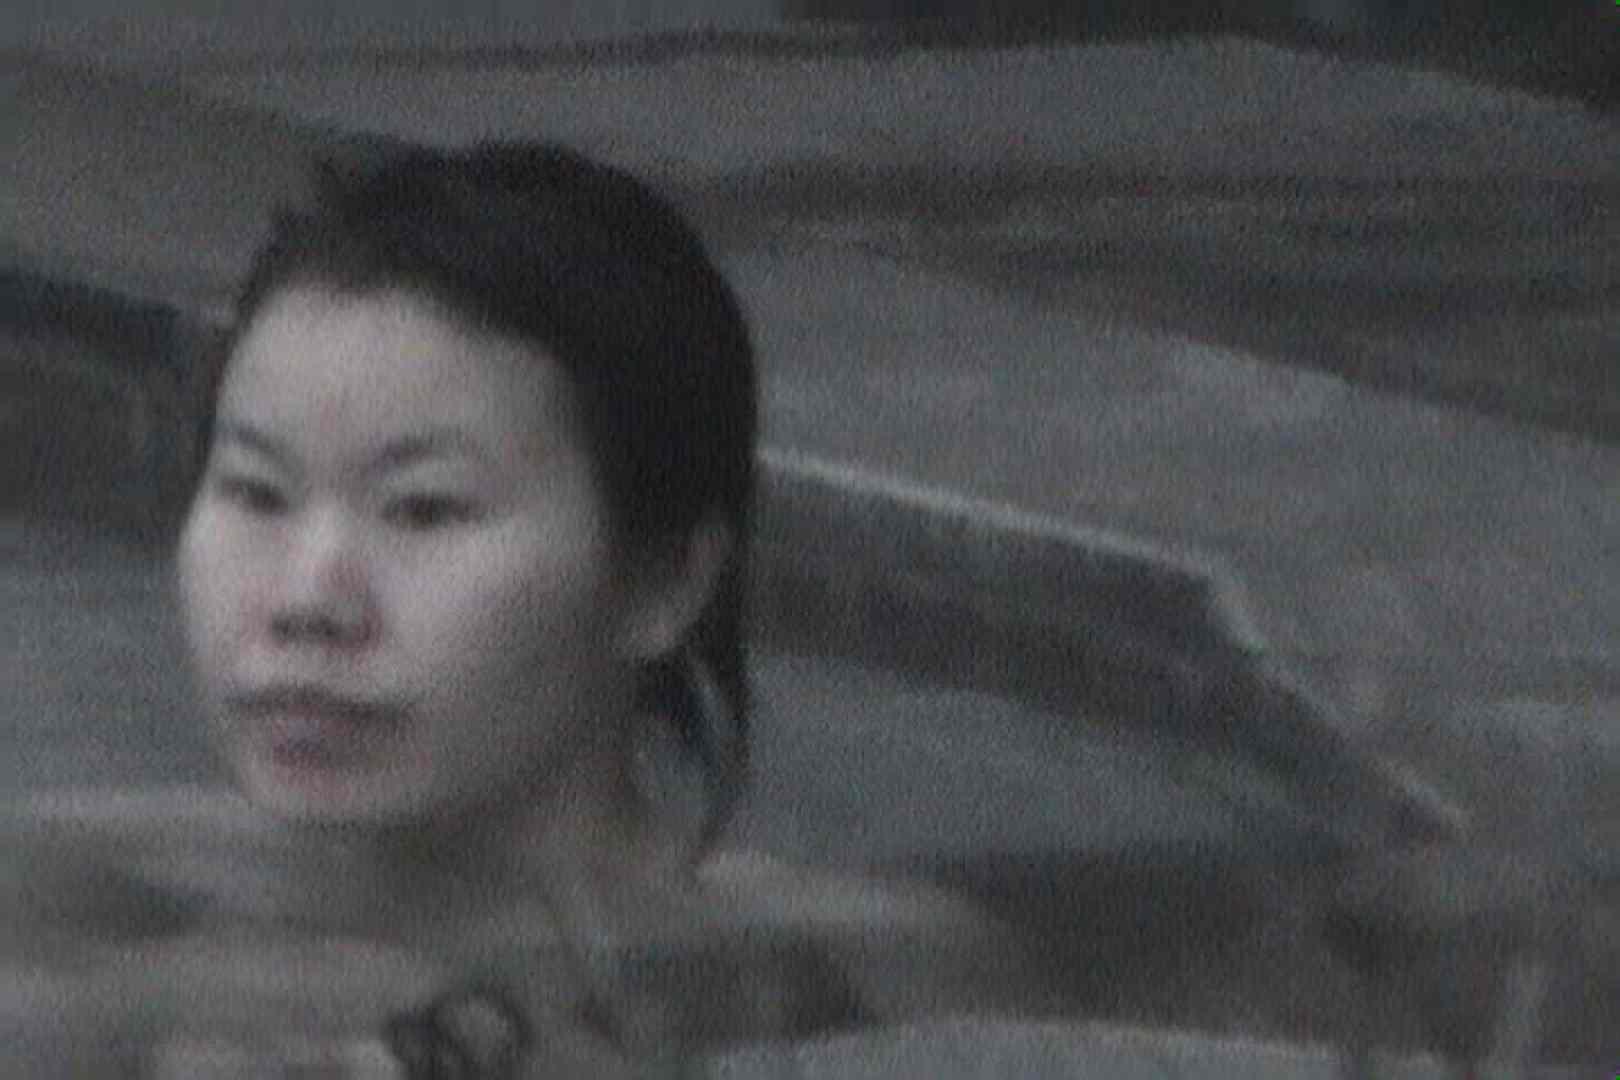 Aquaな露天風呂Vol.556 美しいOLの裸体 すけべAV動画紹介 69pic 14